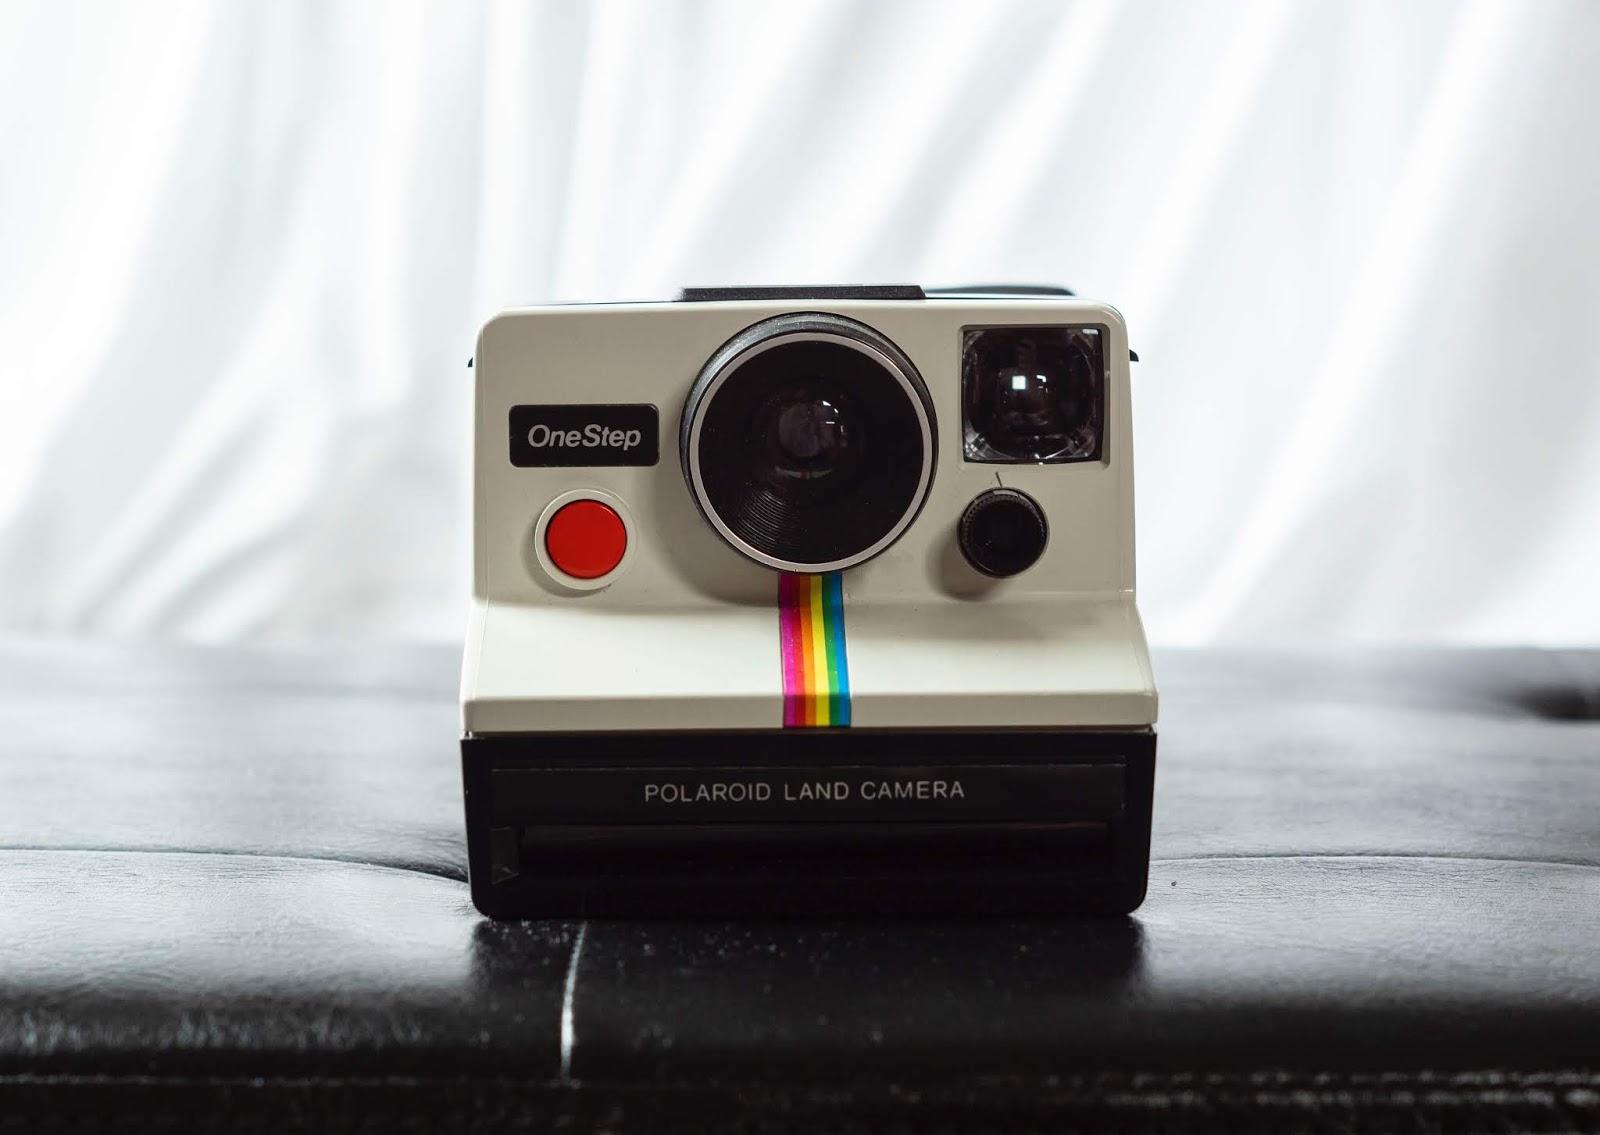 Short Selfie Captions For Instagram